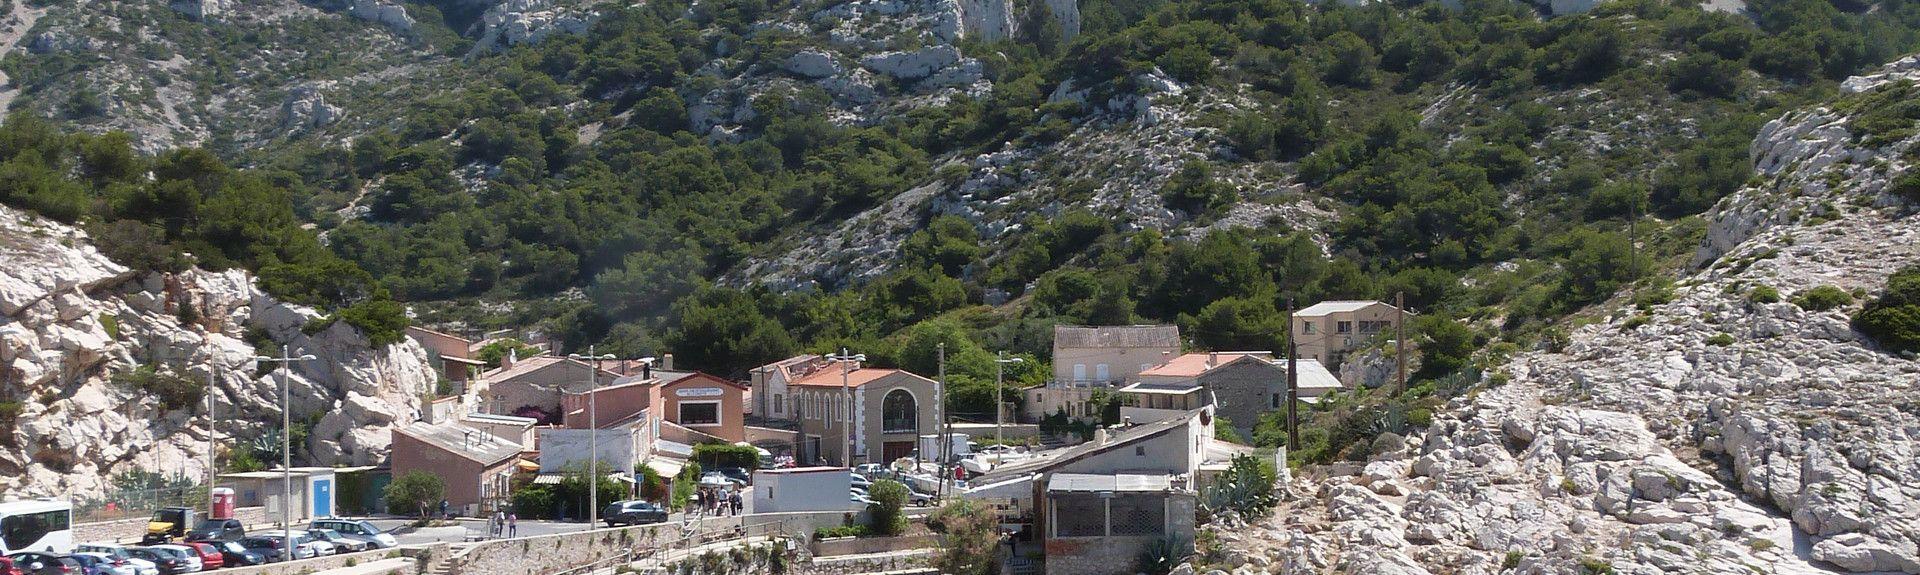 Sormiou, Marseille, France